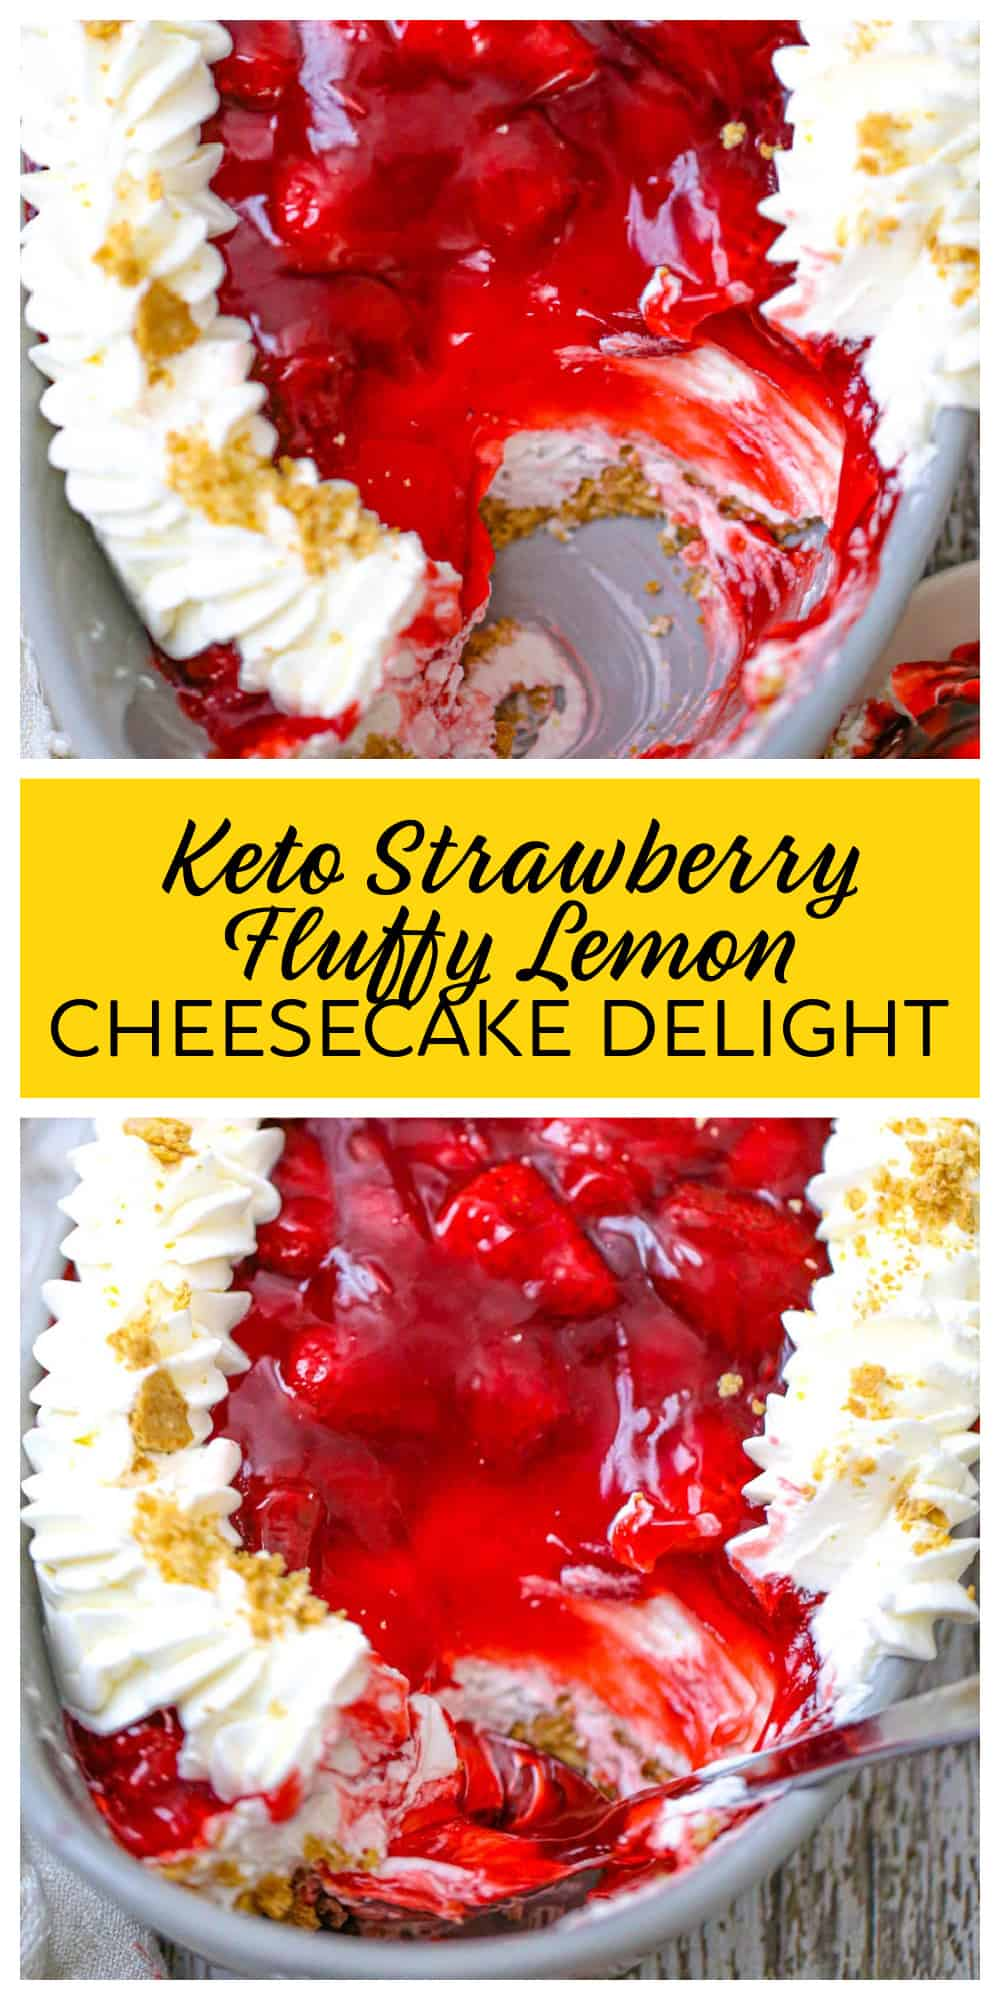 Strawberry Fluffy Lemon Cheesecake Delight